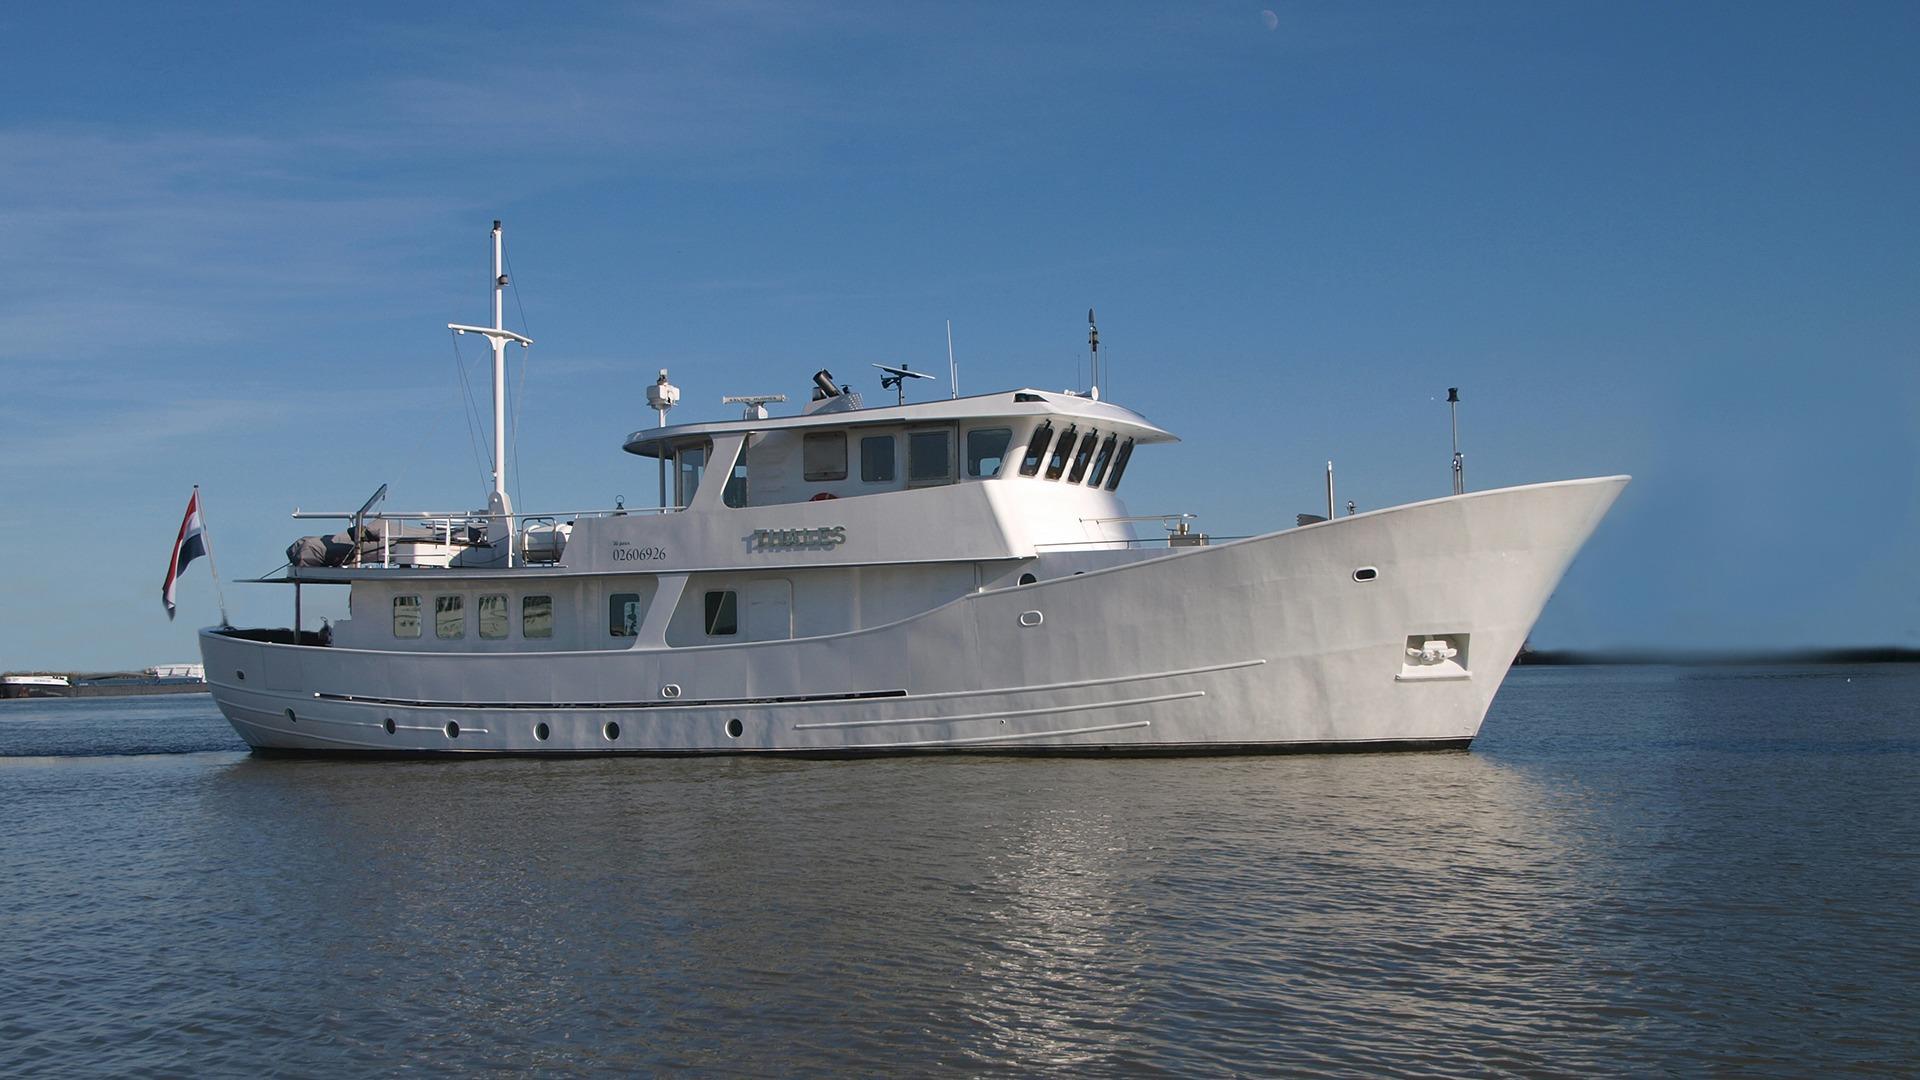 2003 Metz Roode Trawler Charter Power Boat For Sale Www